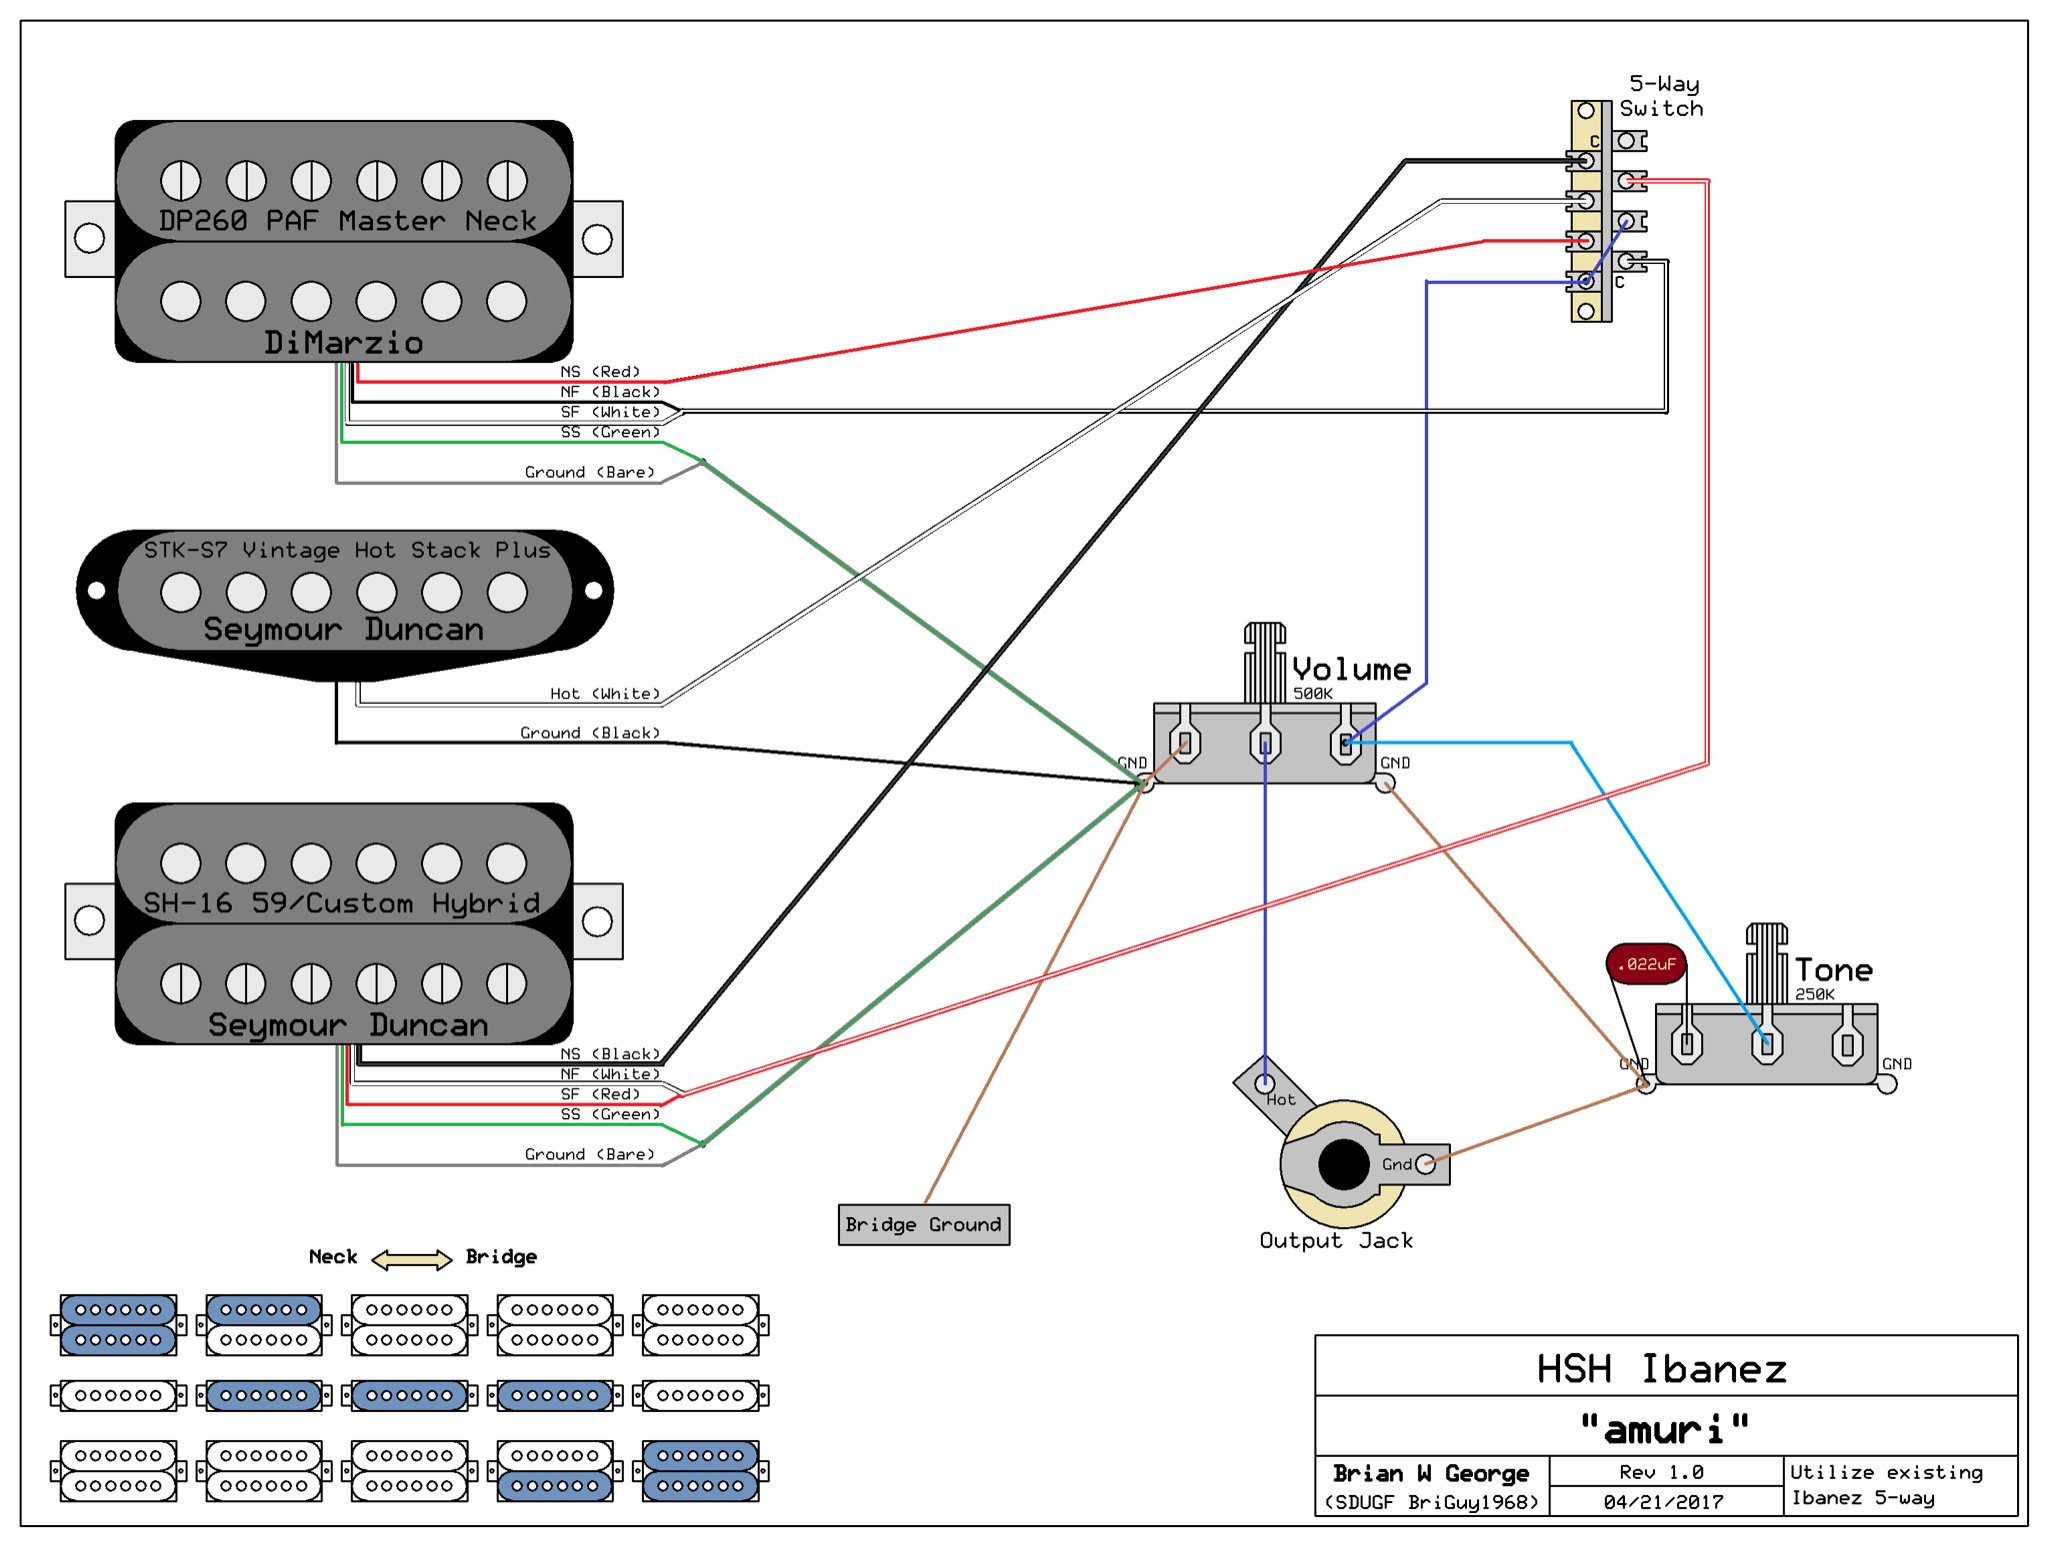 Wiring Help - Ibanez 5 Way Switch - 5 Way Switch Wiring Diagram